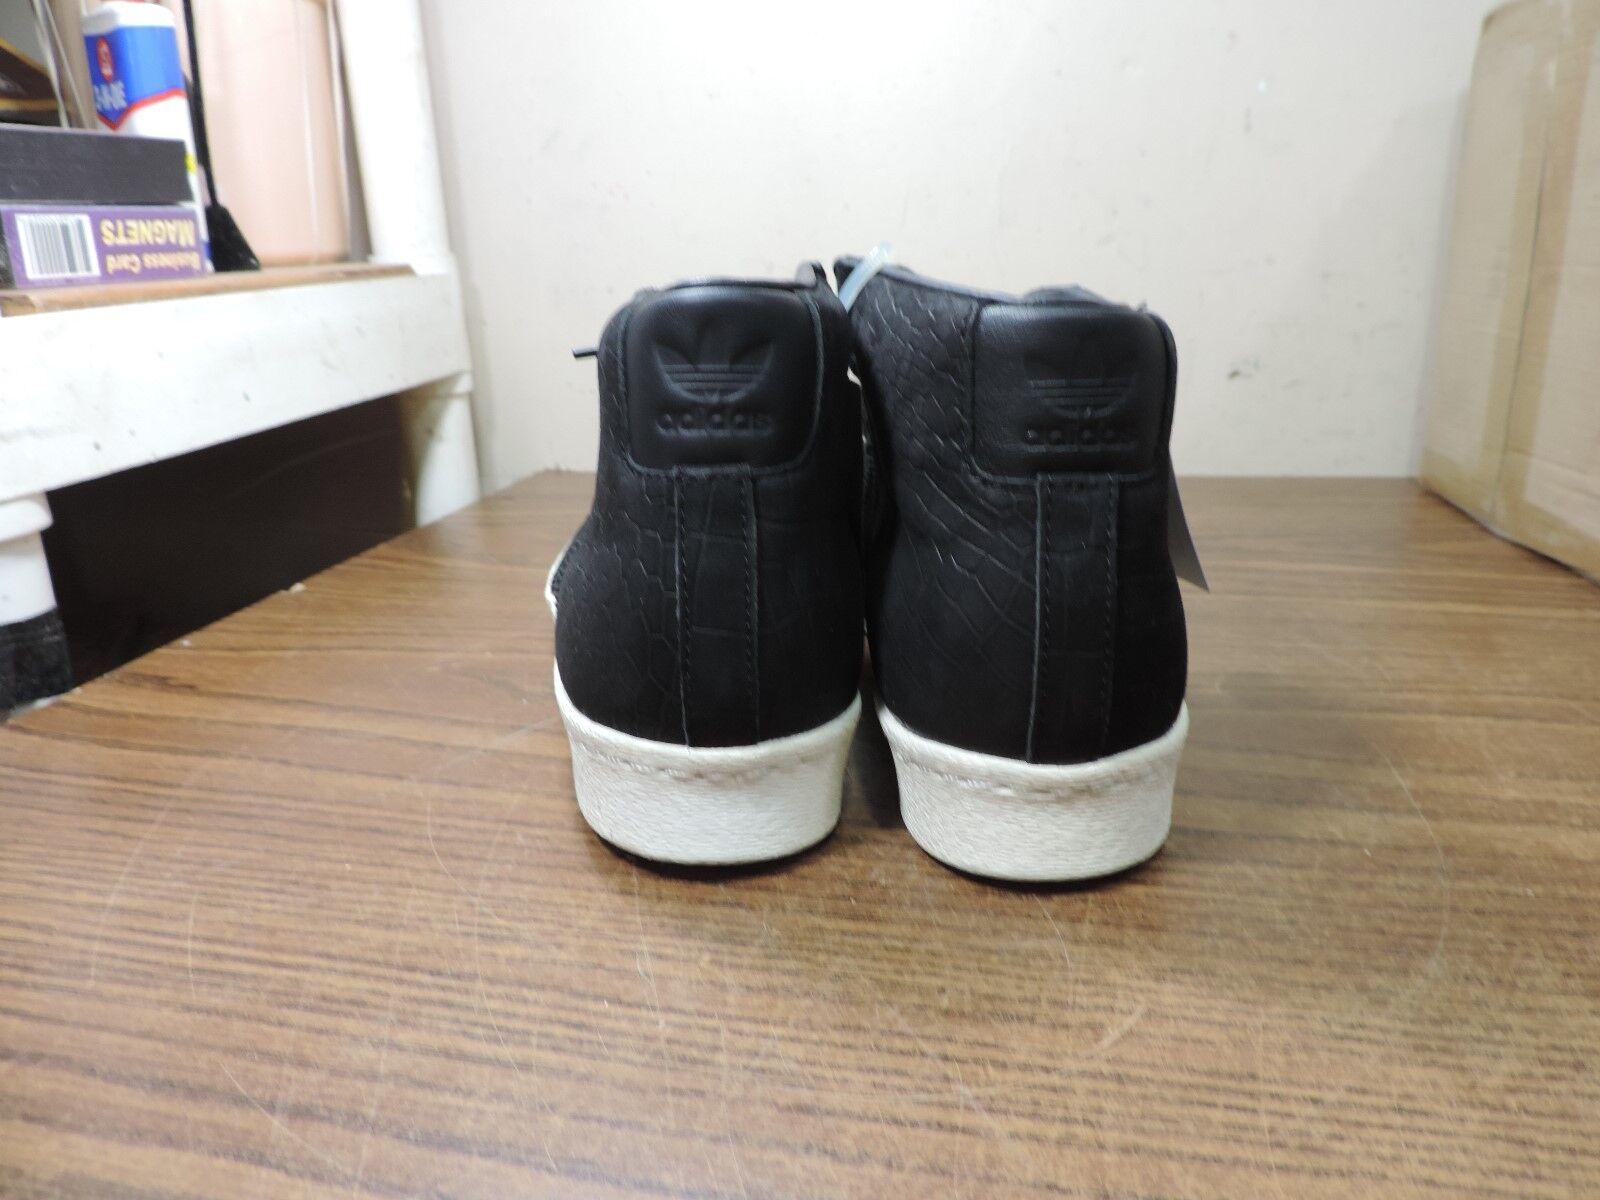 Adidas Originals Pro Pro Pro Model Metal Toe Women's Trainers Black gold US 9 3731b8